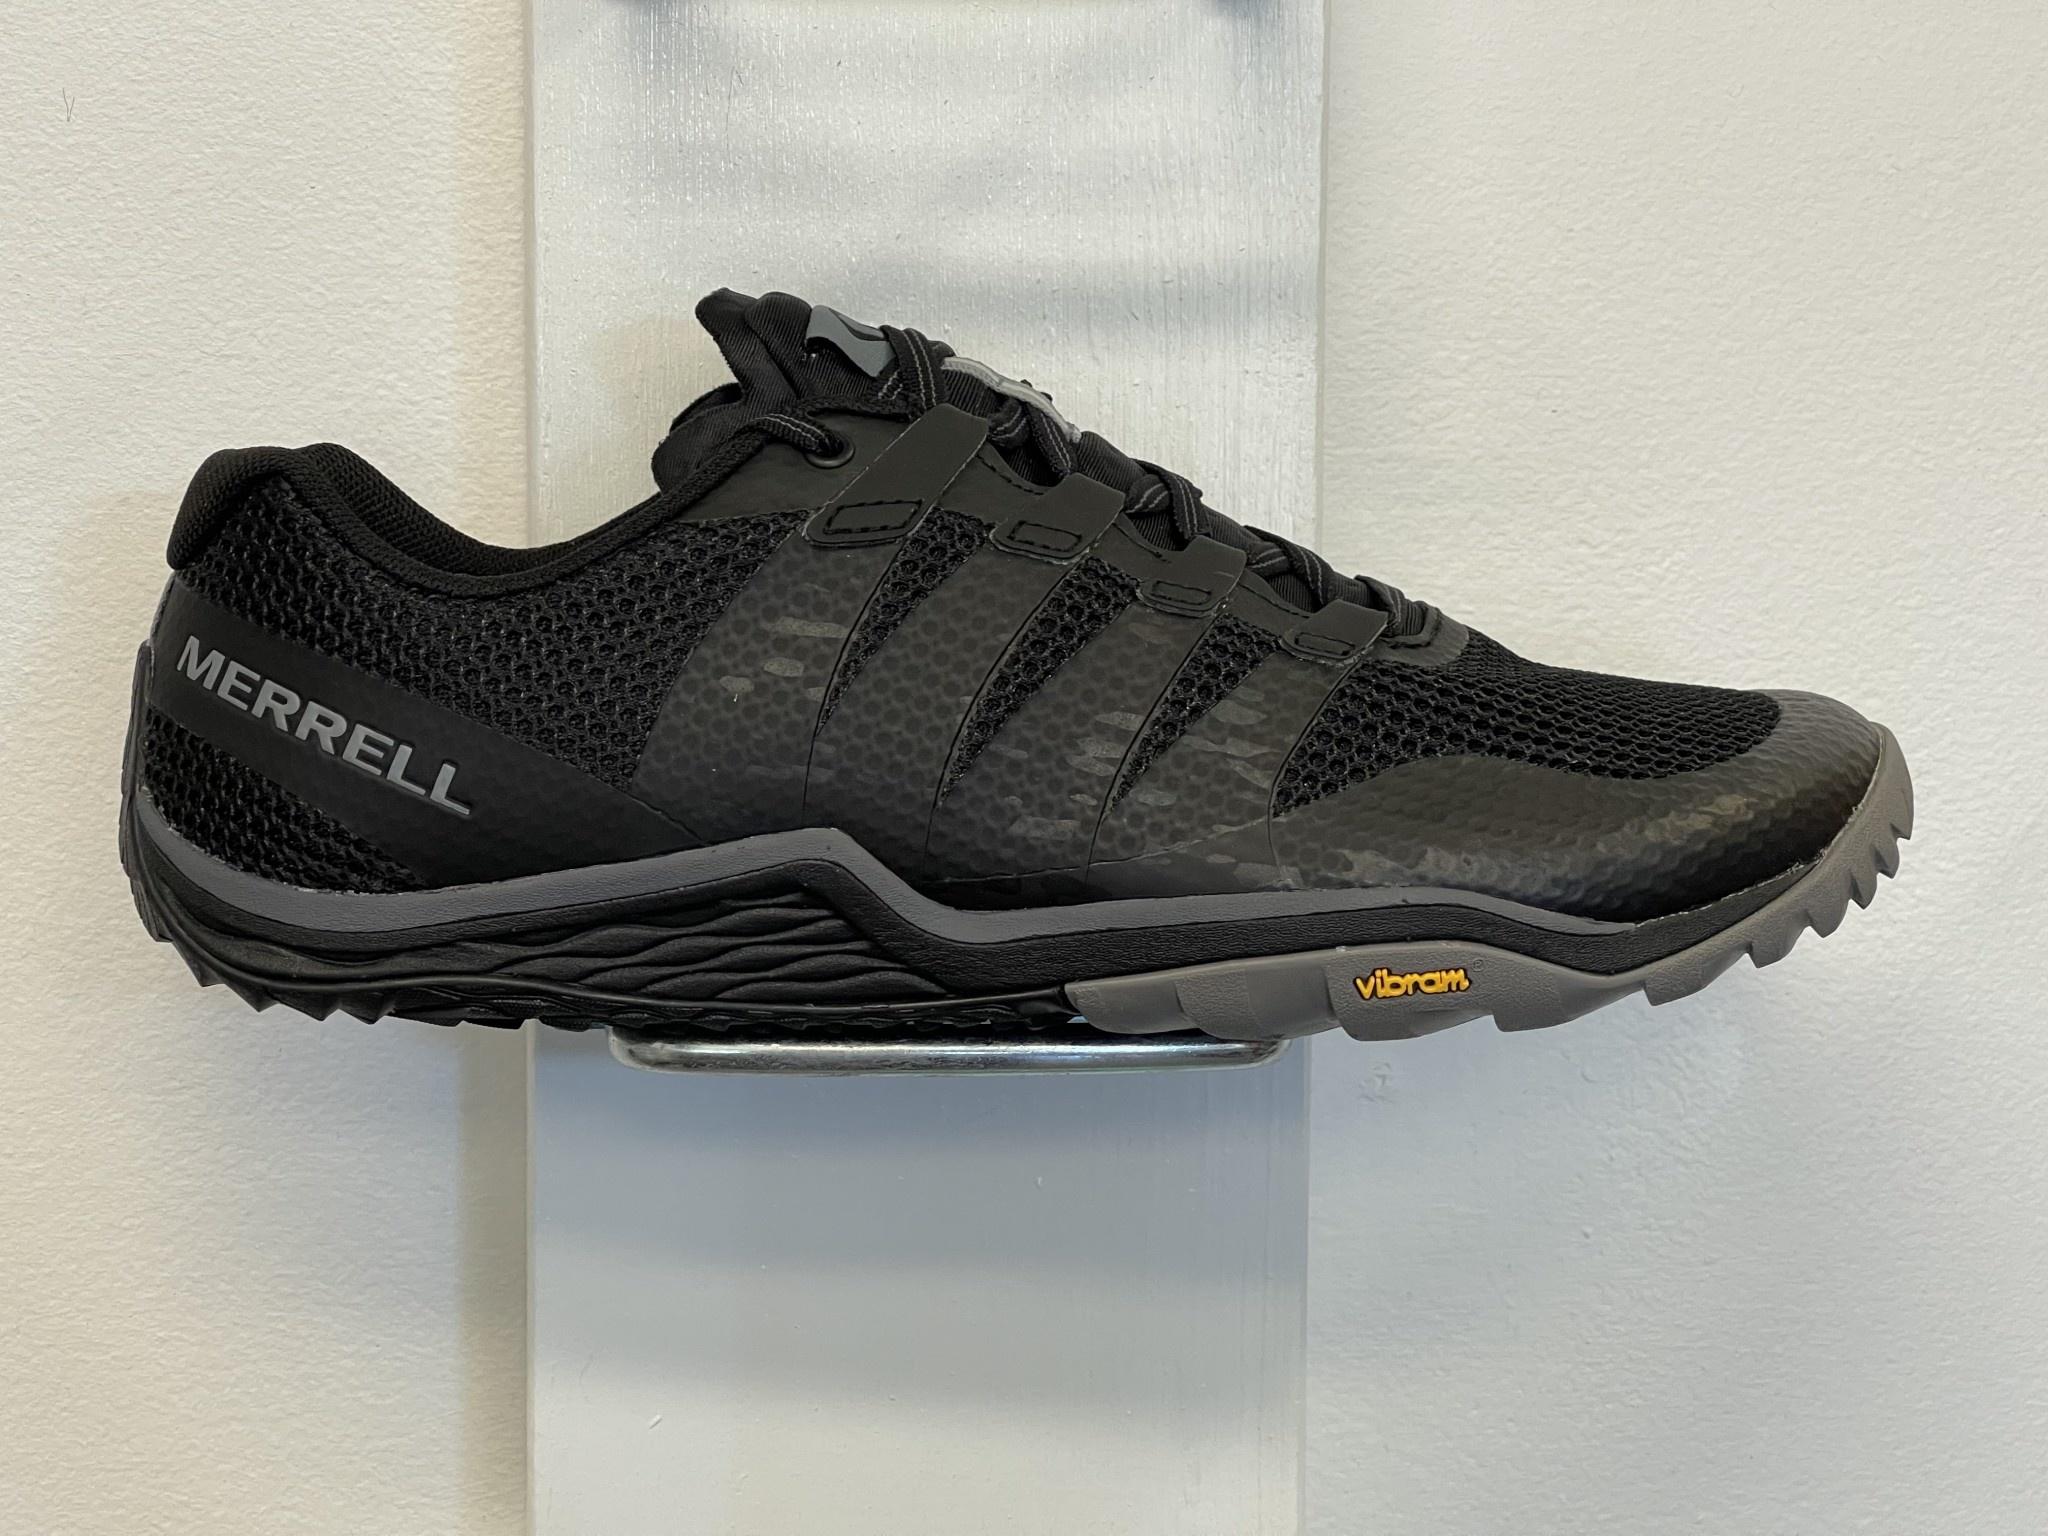 Merrell Merrell Trail Glove 5 (Women's 5, 7.5, 11)